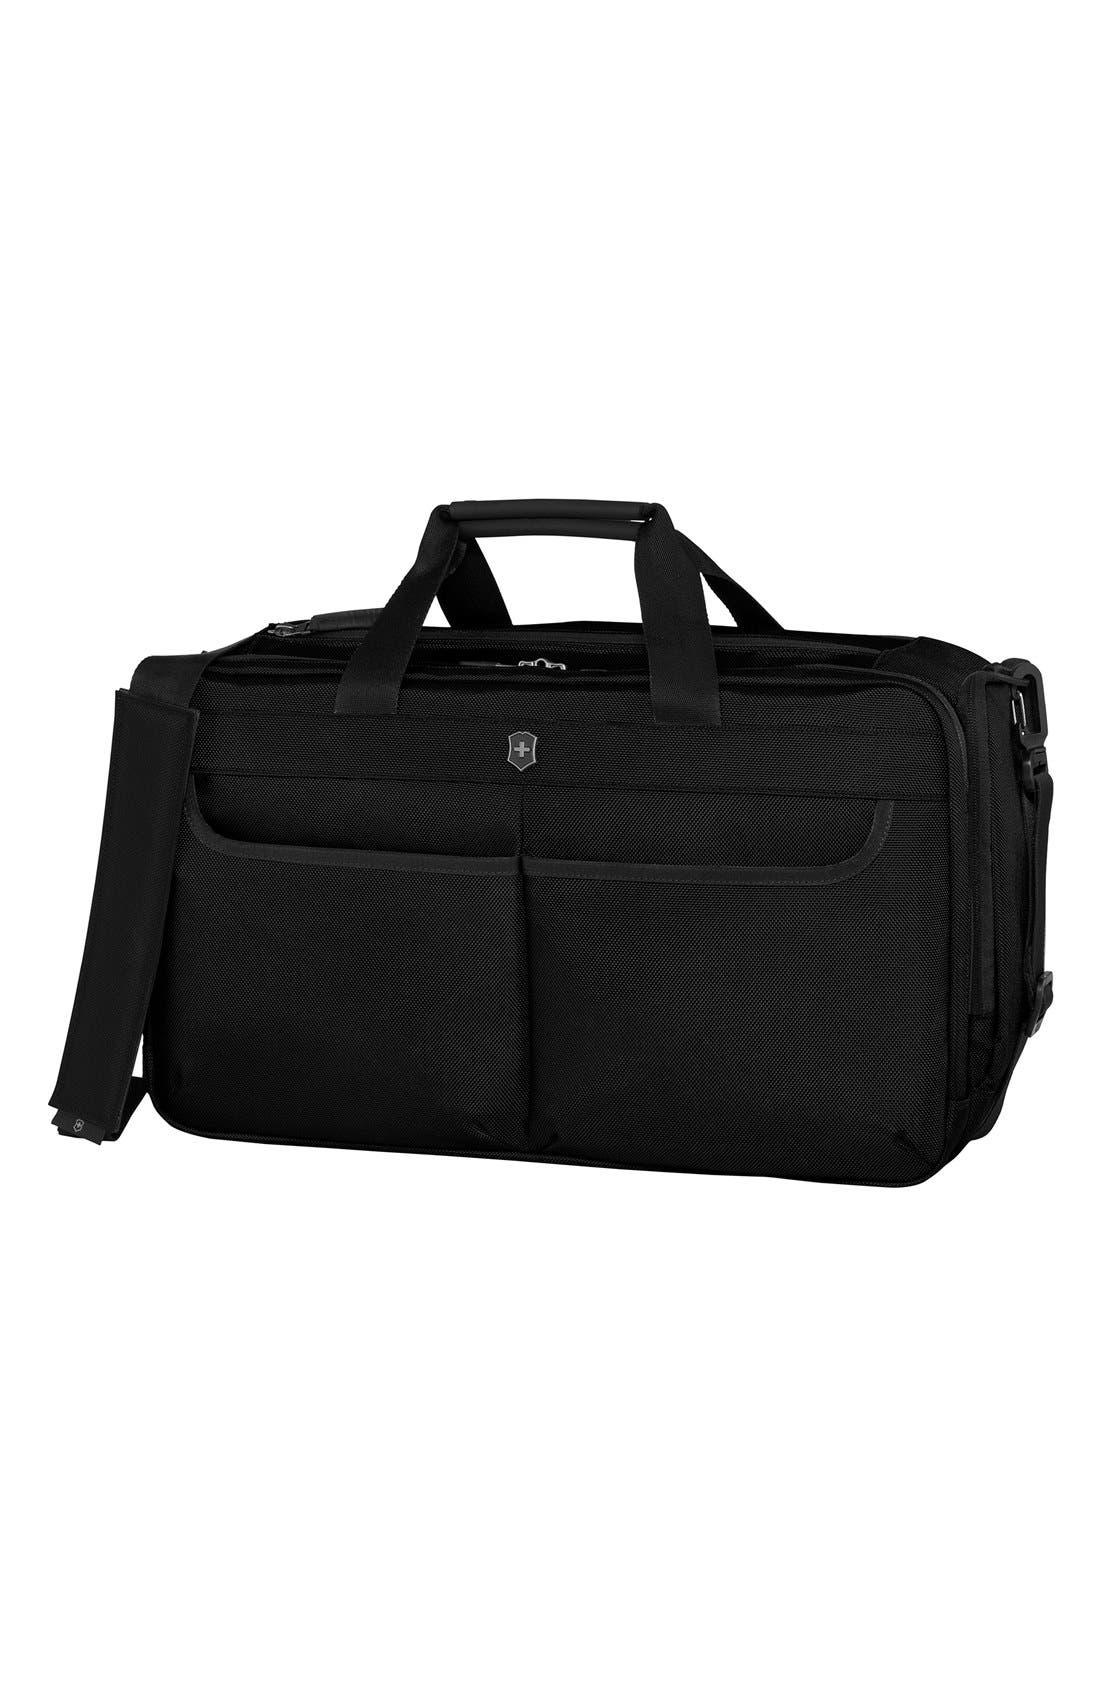 WT 5.0 Duffel Bag,                         Main,                         color,